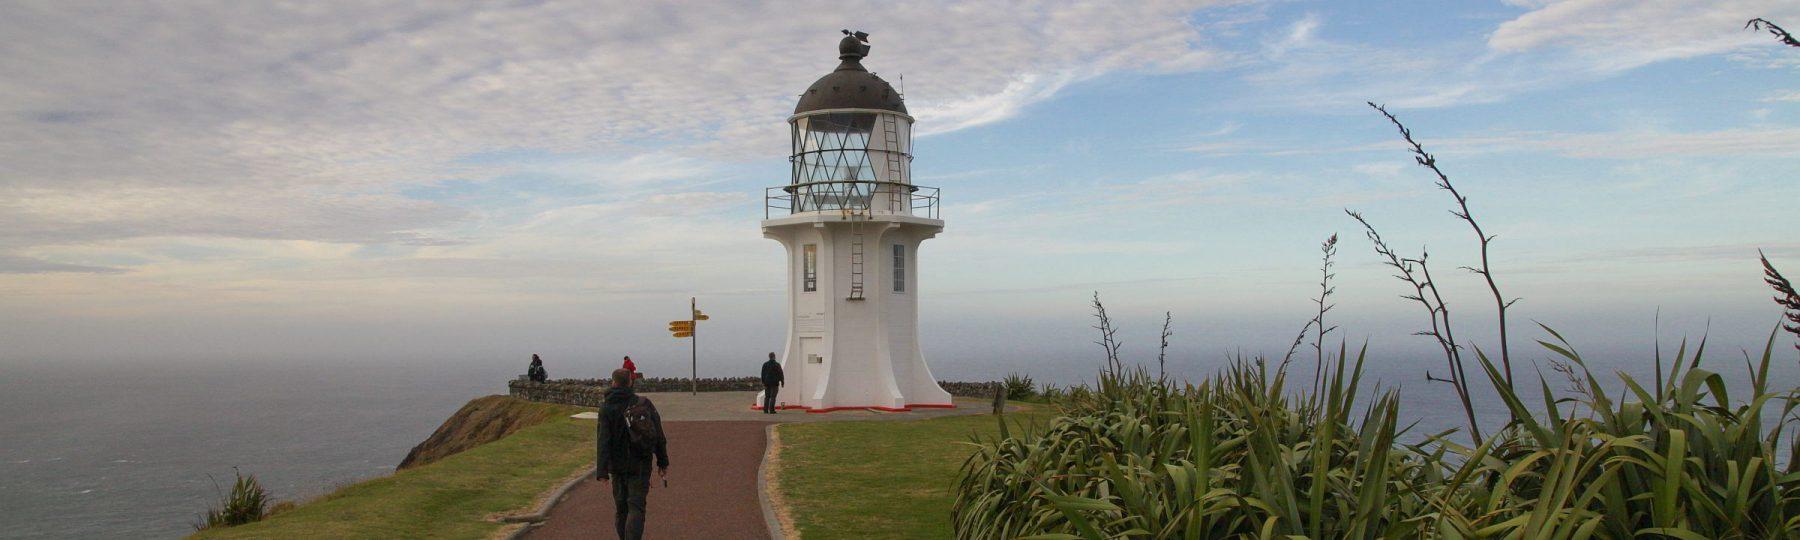 Leuchturm von Cape Reinga an der Nordspitze Neuseelands